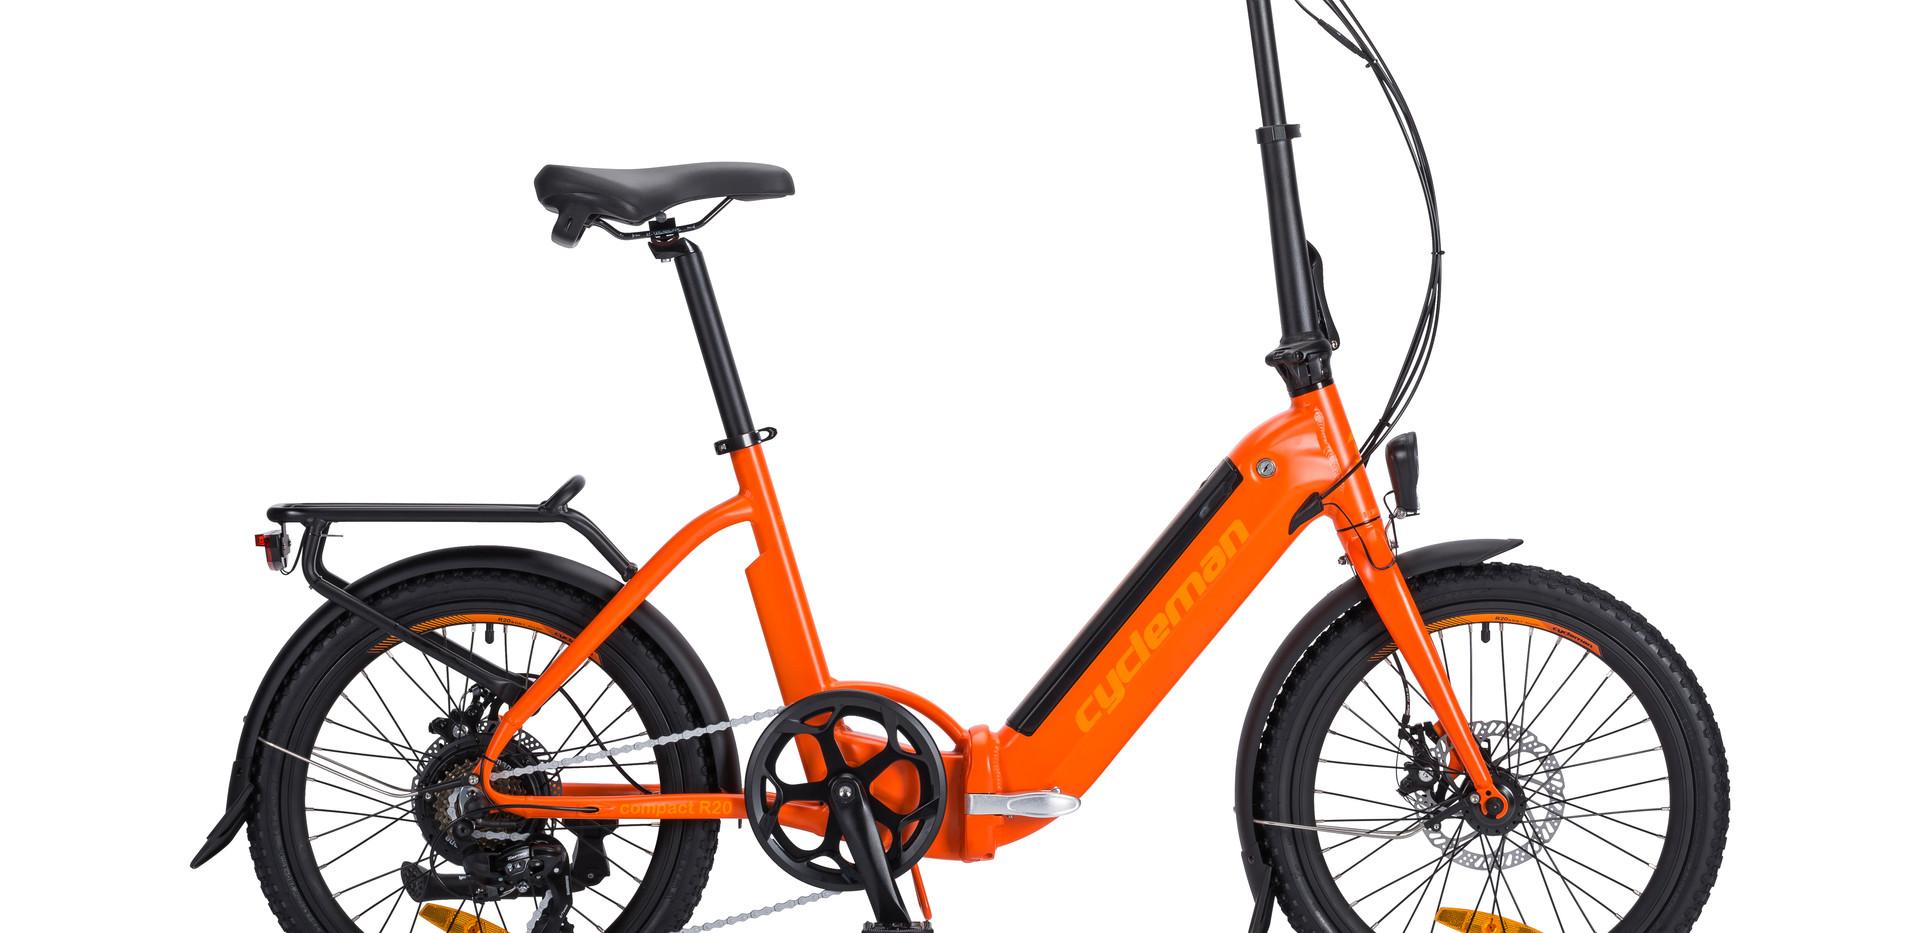 Visiobike Cycleman 20 R370